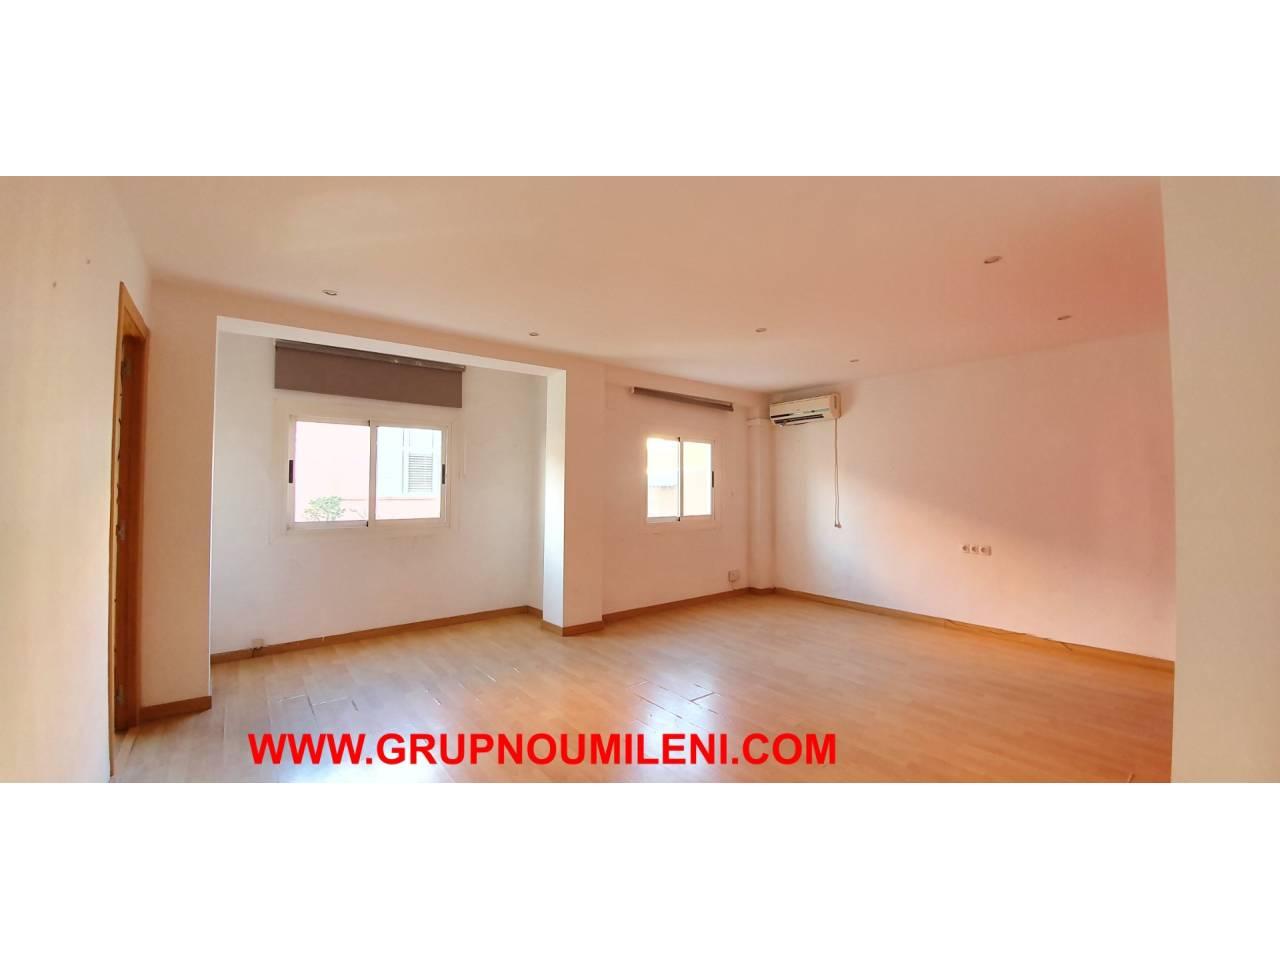 Rent Flat  Sedaví. Superf. 67 m²,  2 habitaciones (1 doble,  1 individual),  1 baño